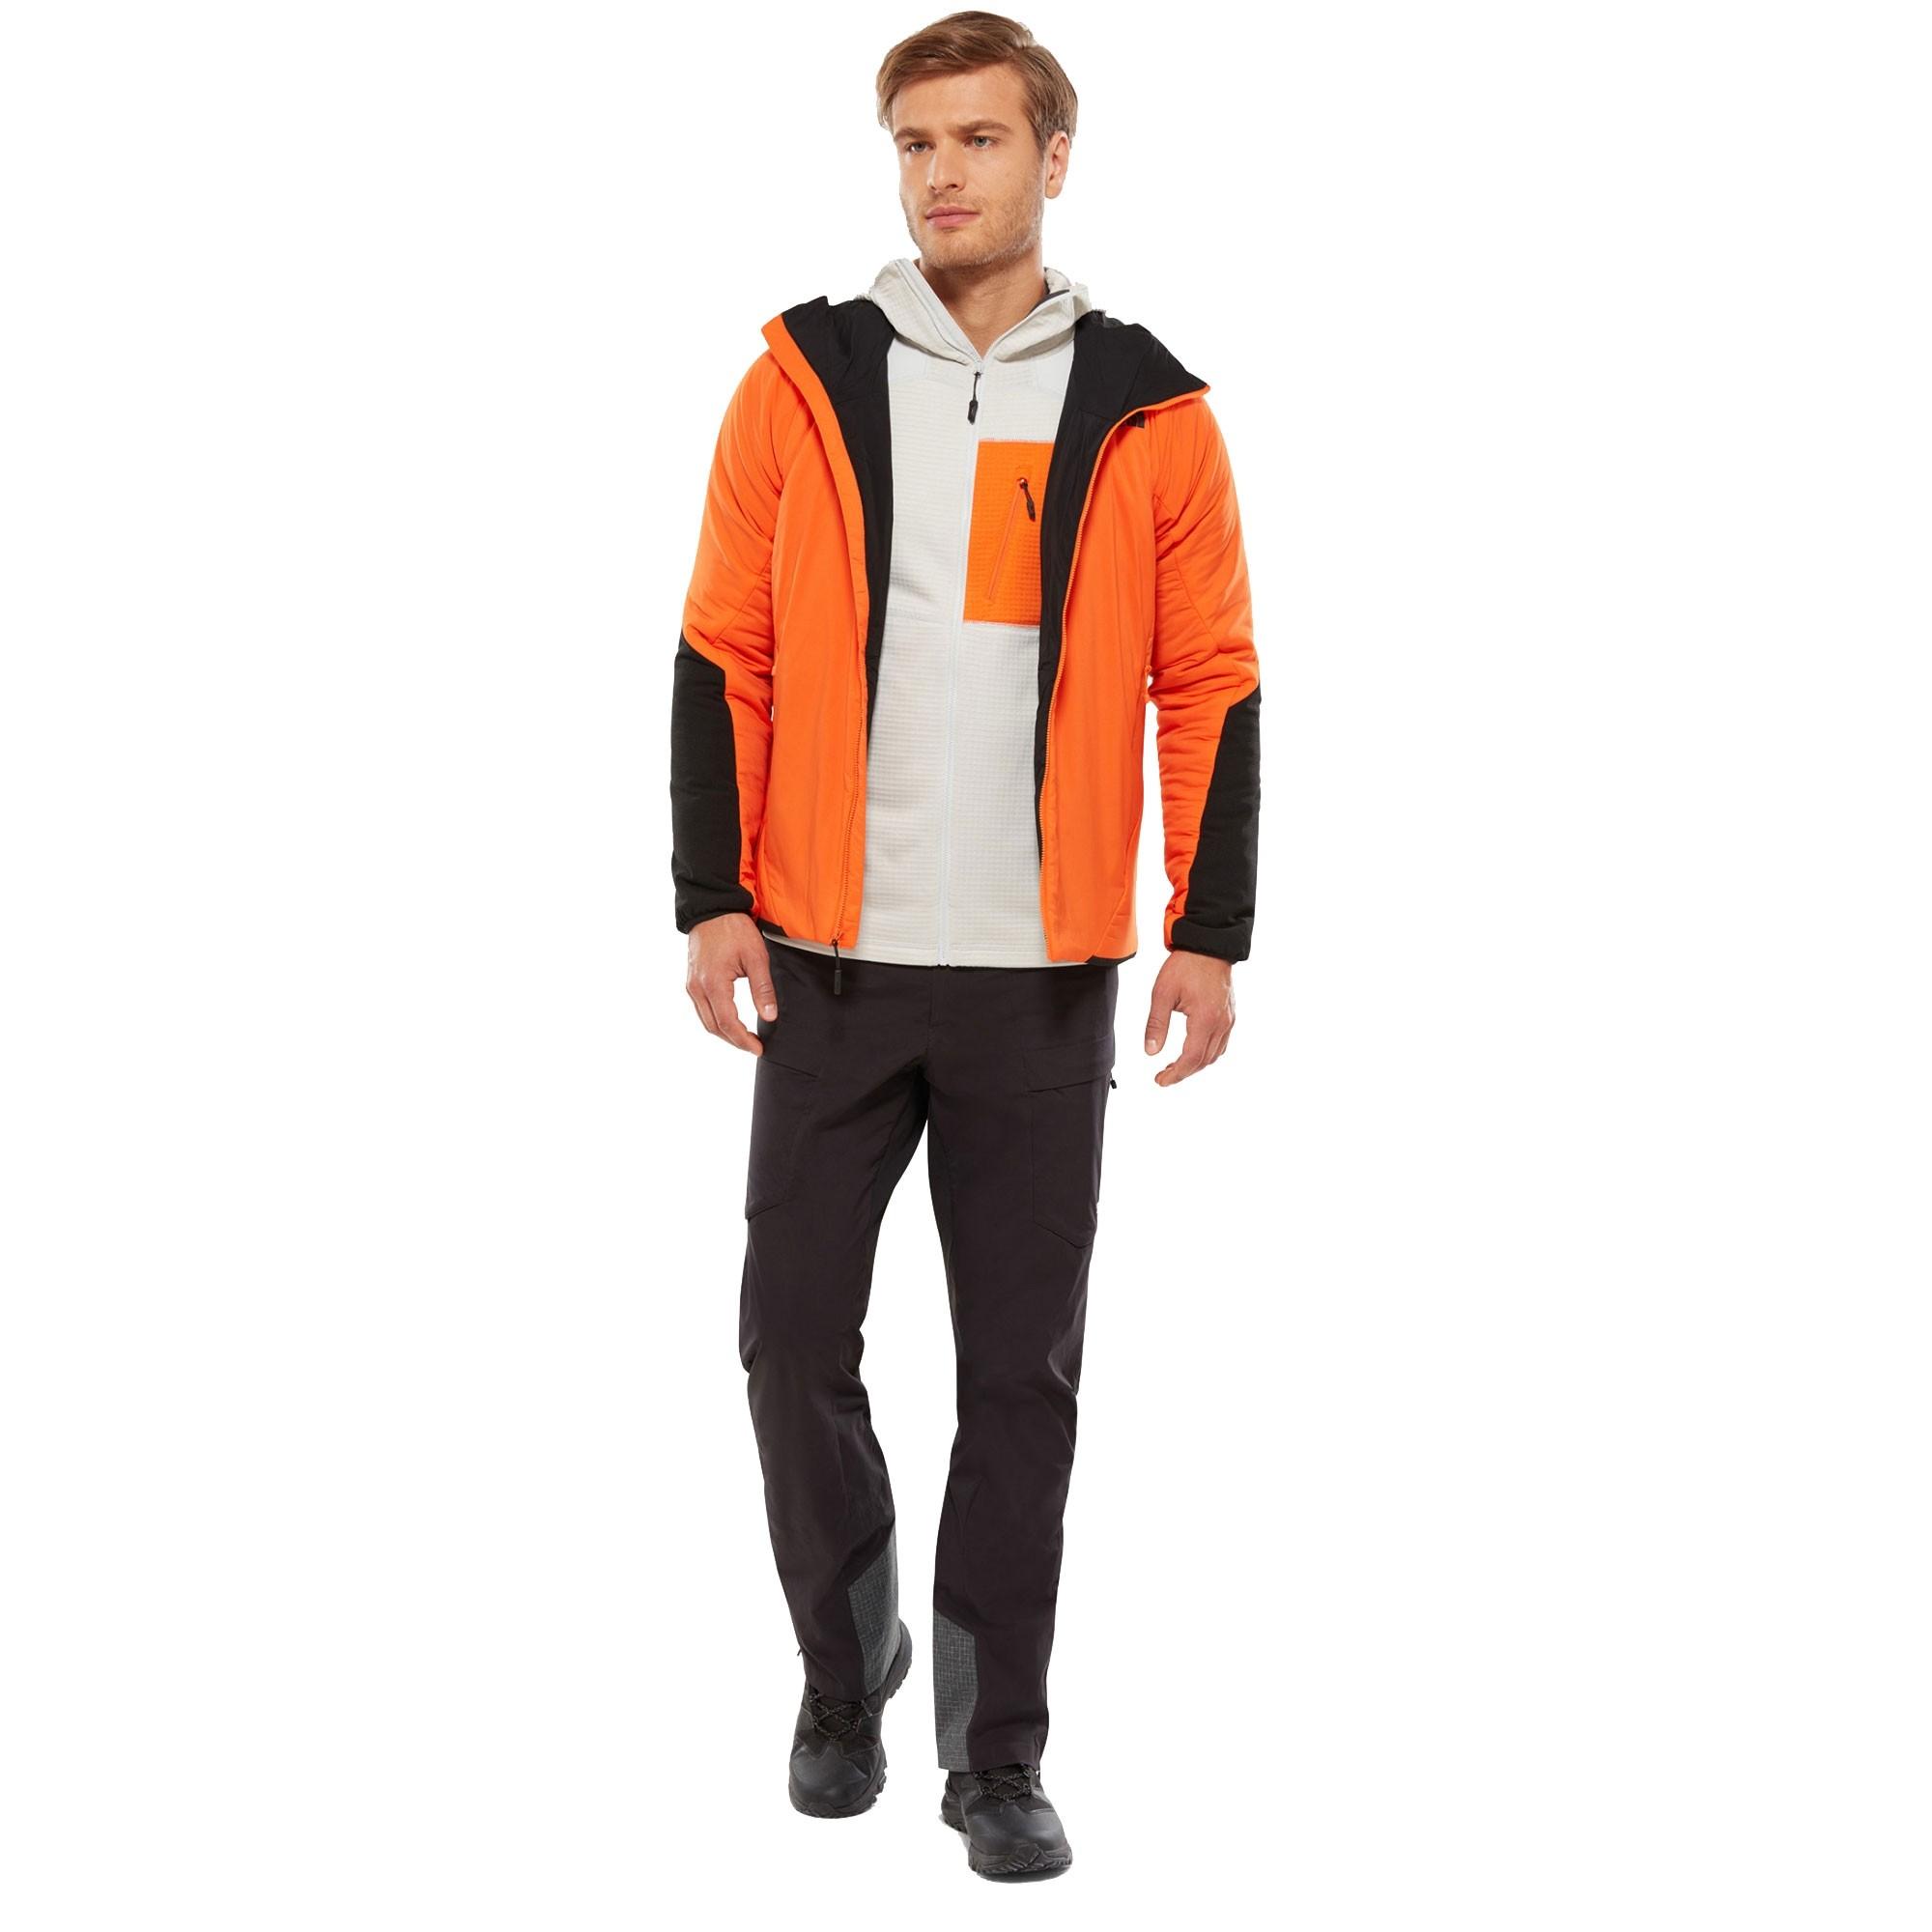 The North Face Ventrix Men's Insulated Hoodie - Persian Orange/TNF Black - front